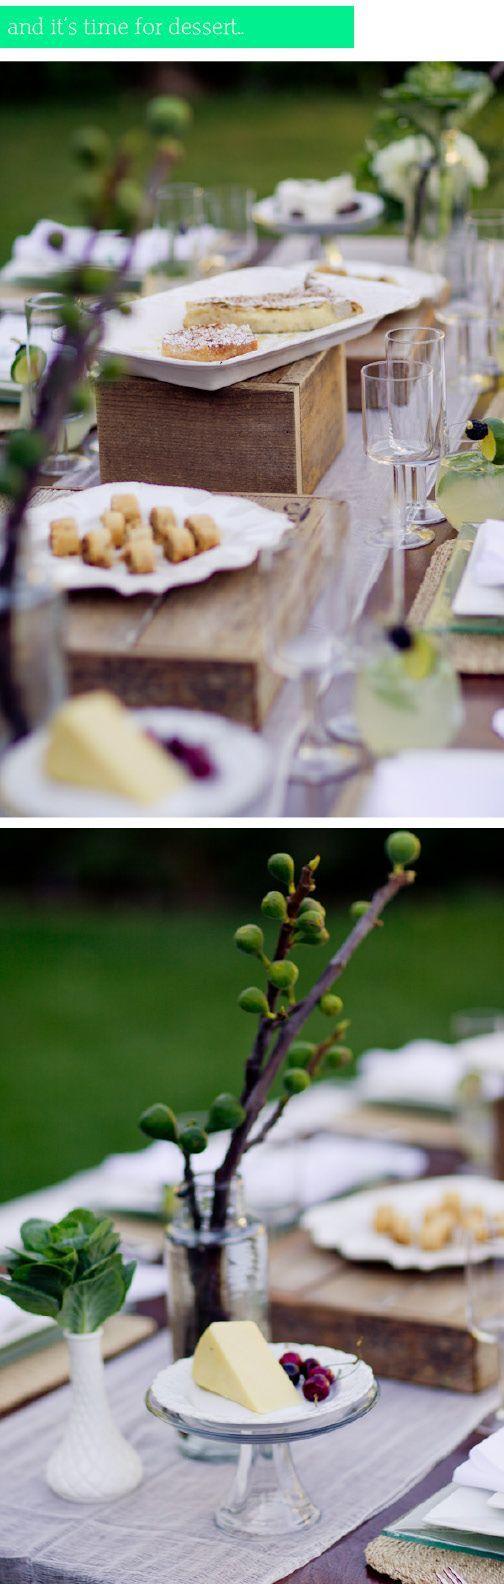 White and green setting table |Green grape and white flowers |  Uva verde e fiori bianchi | http://theproposalwedding.blogspot.it/ #autumn #fall #wedding #grape #wine #september #matrimonio #autunno #vino #uva